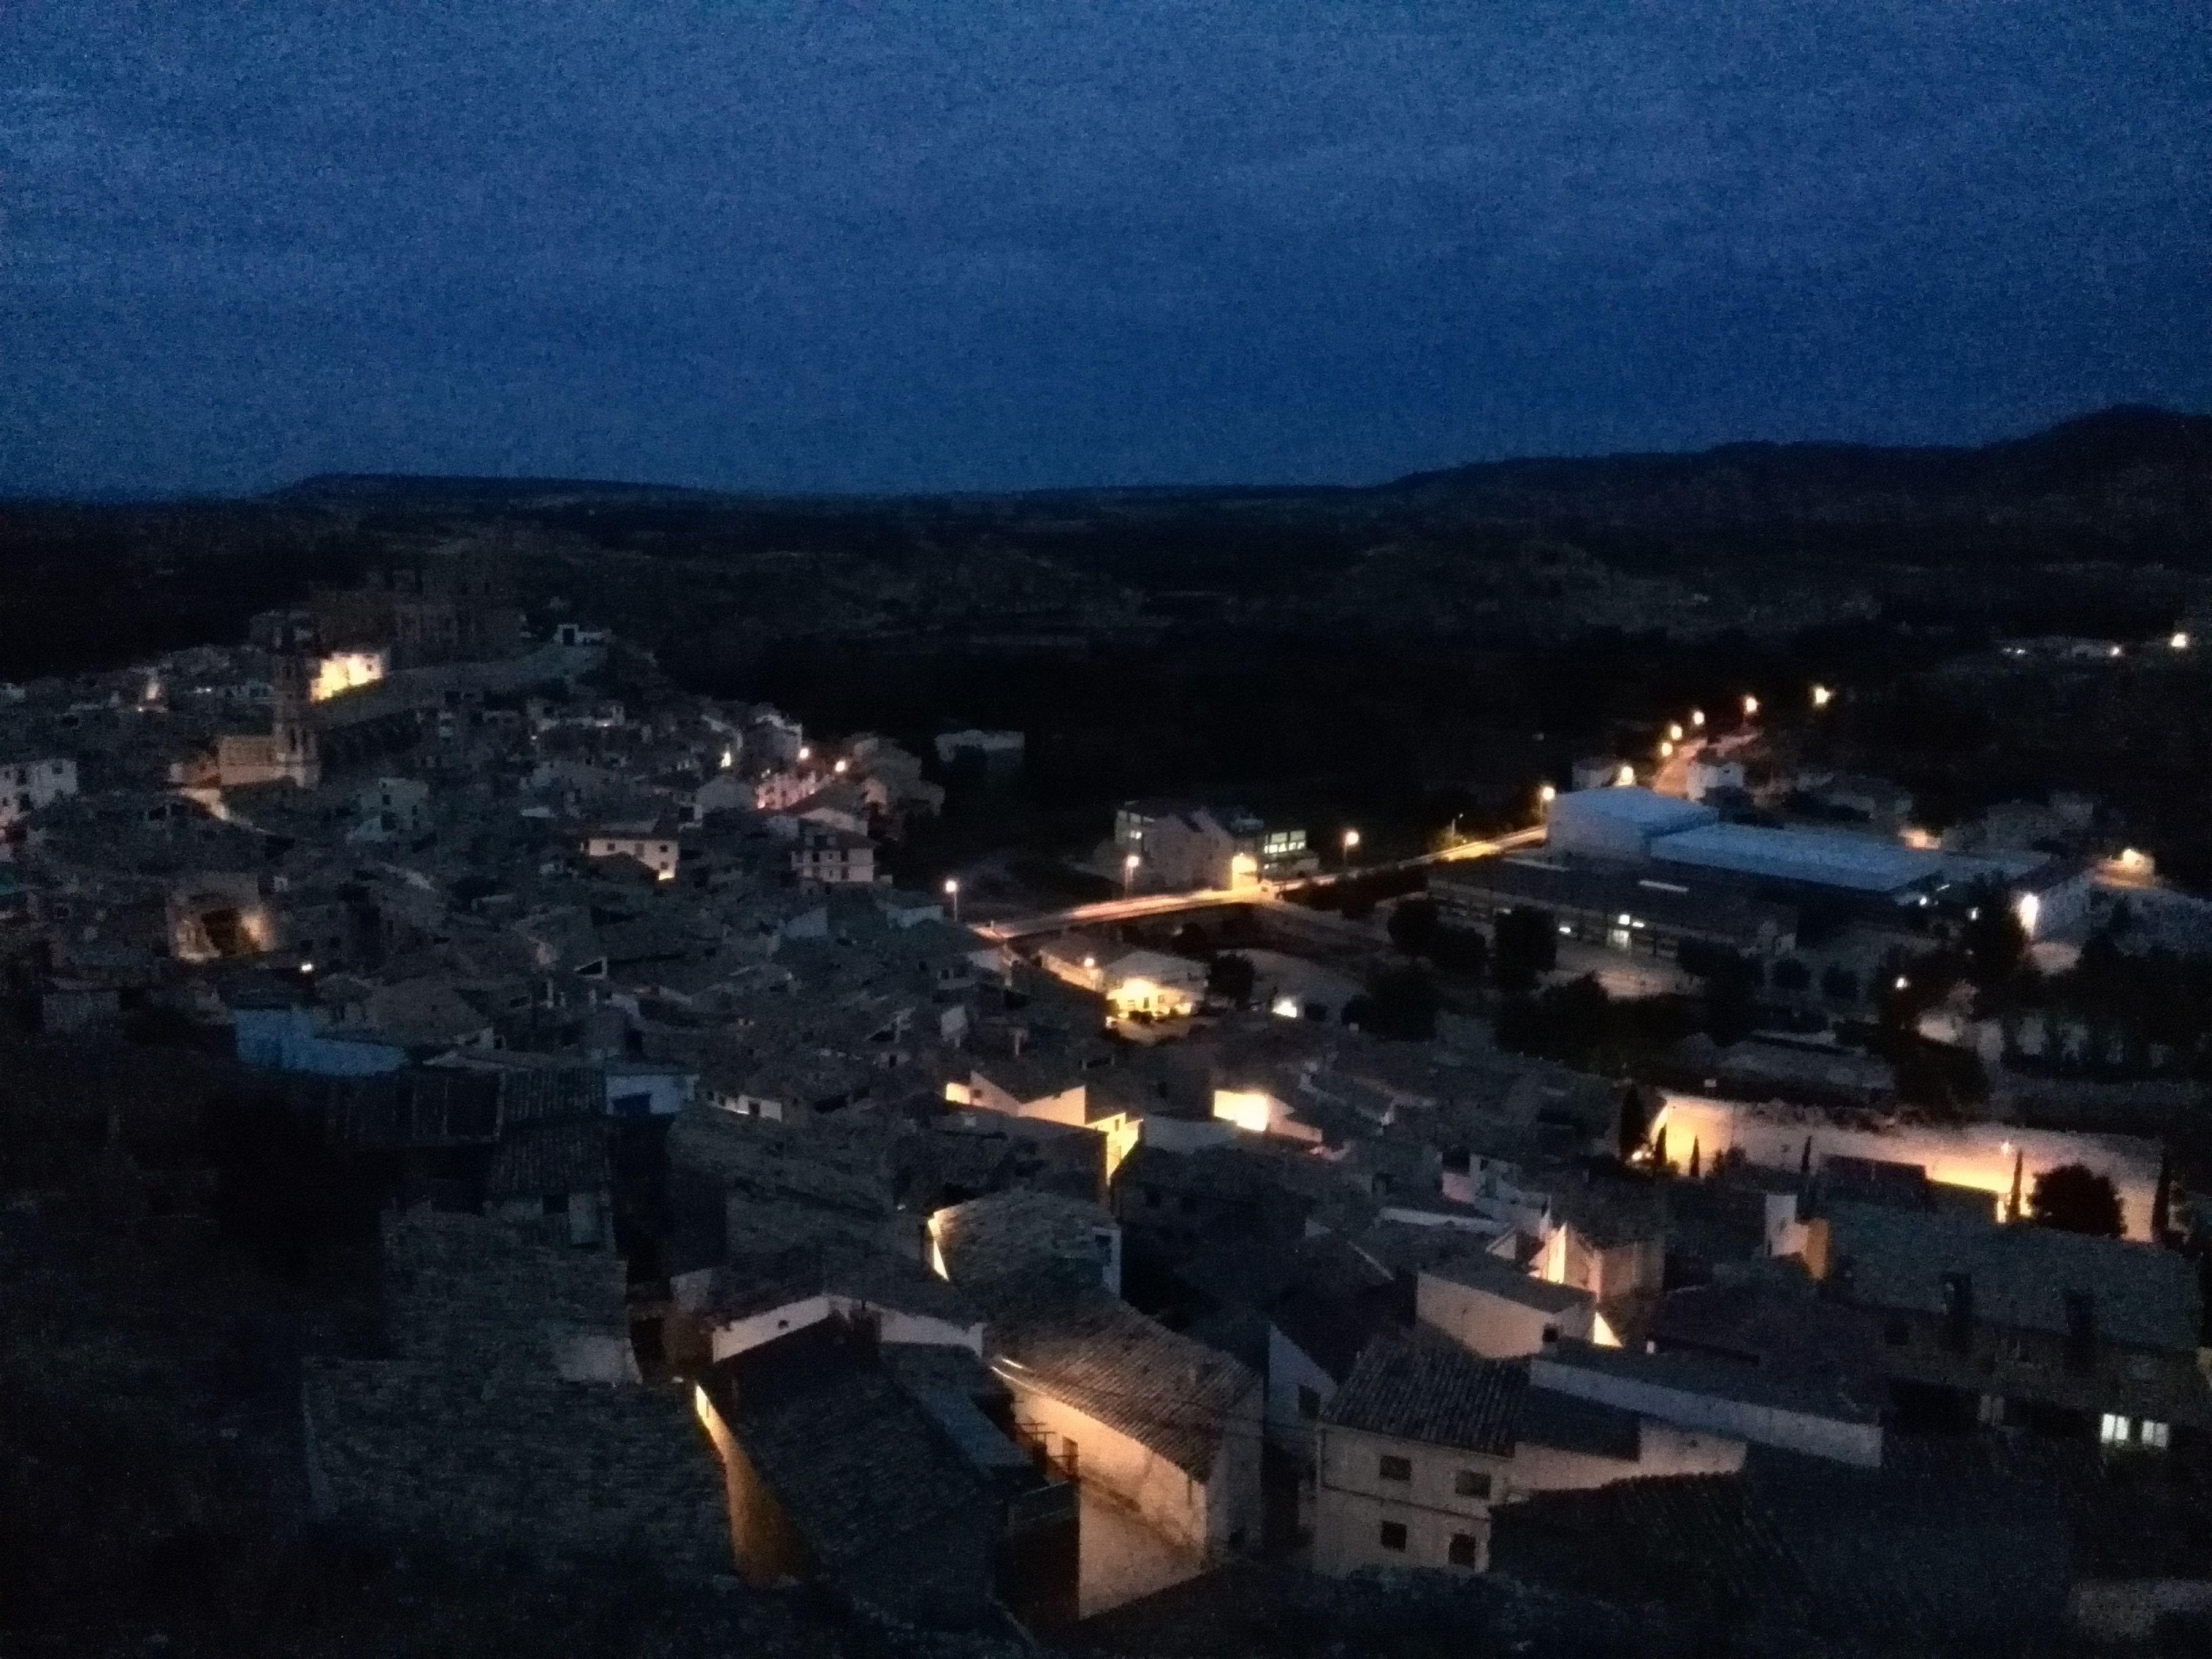 Atardecer en Albalate del Arzobispo, Teruel. http://www.ebroverde.es/bajo-martin/